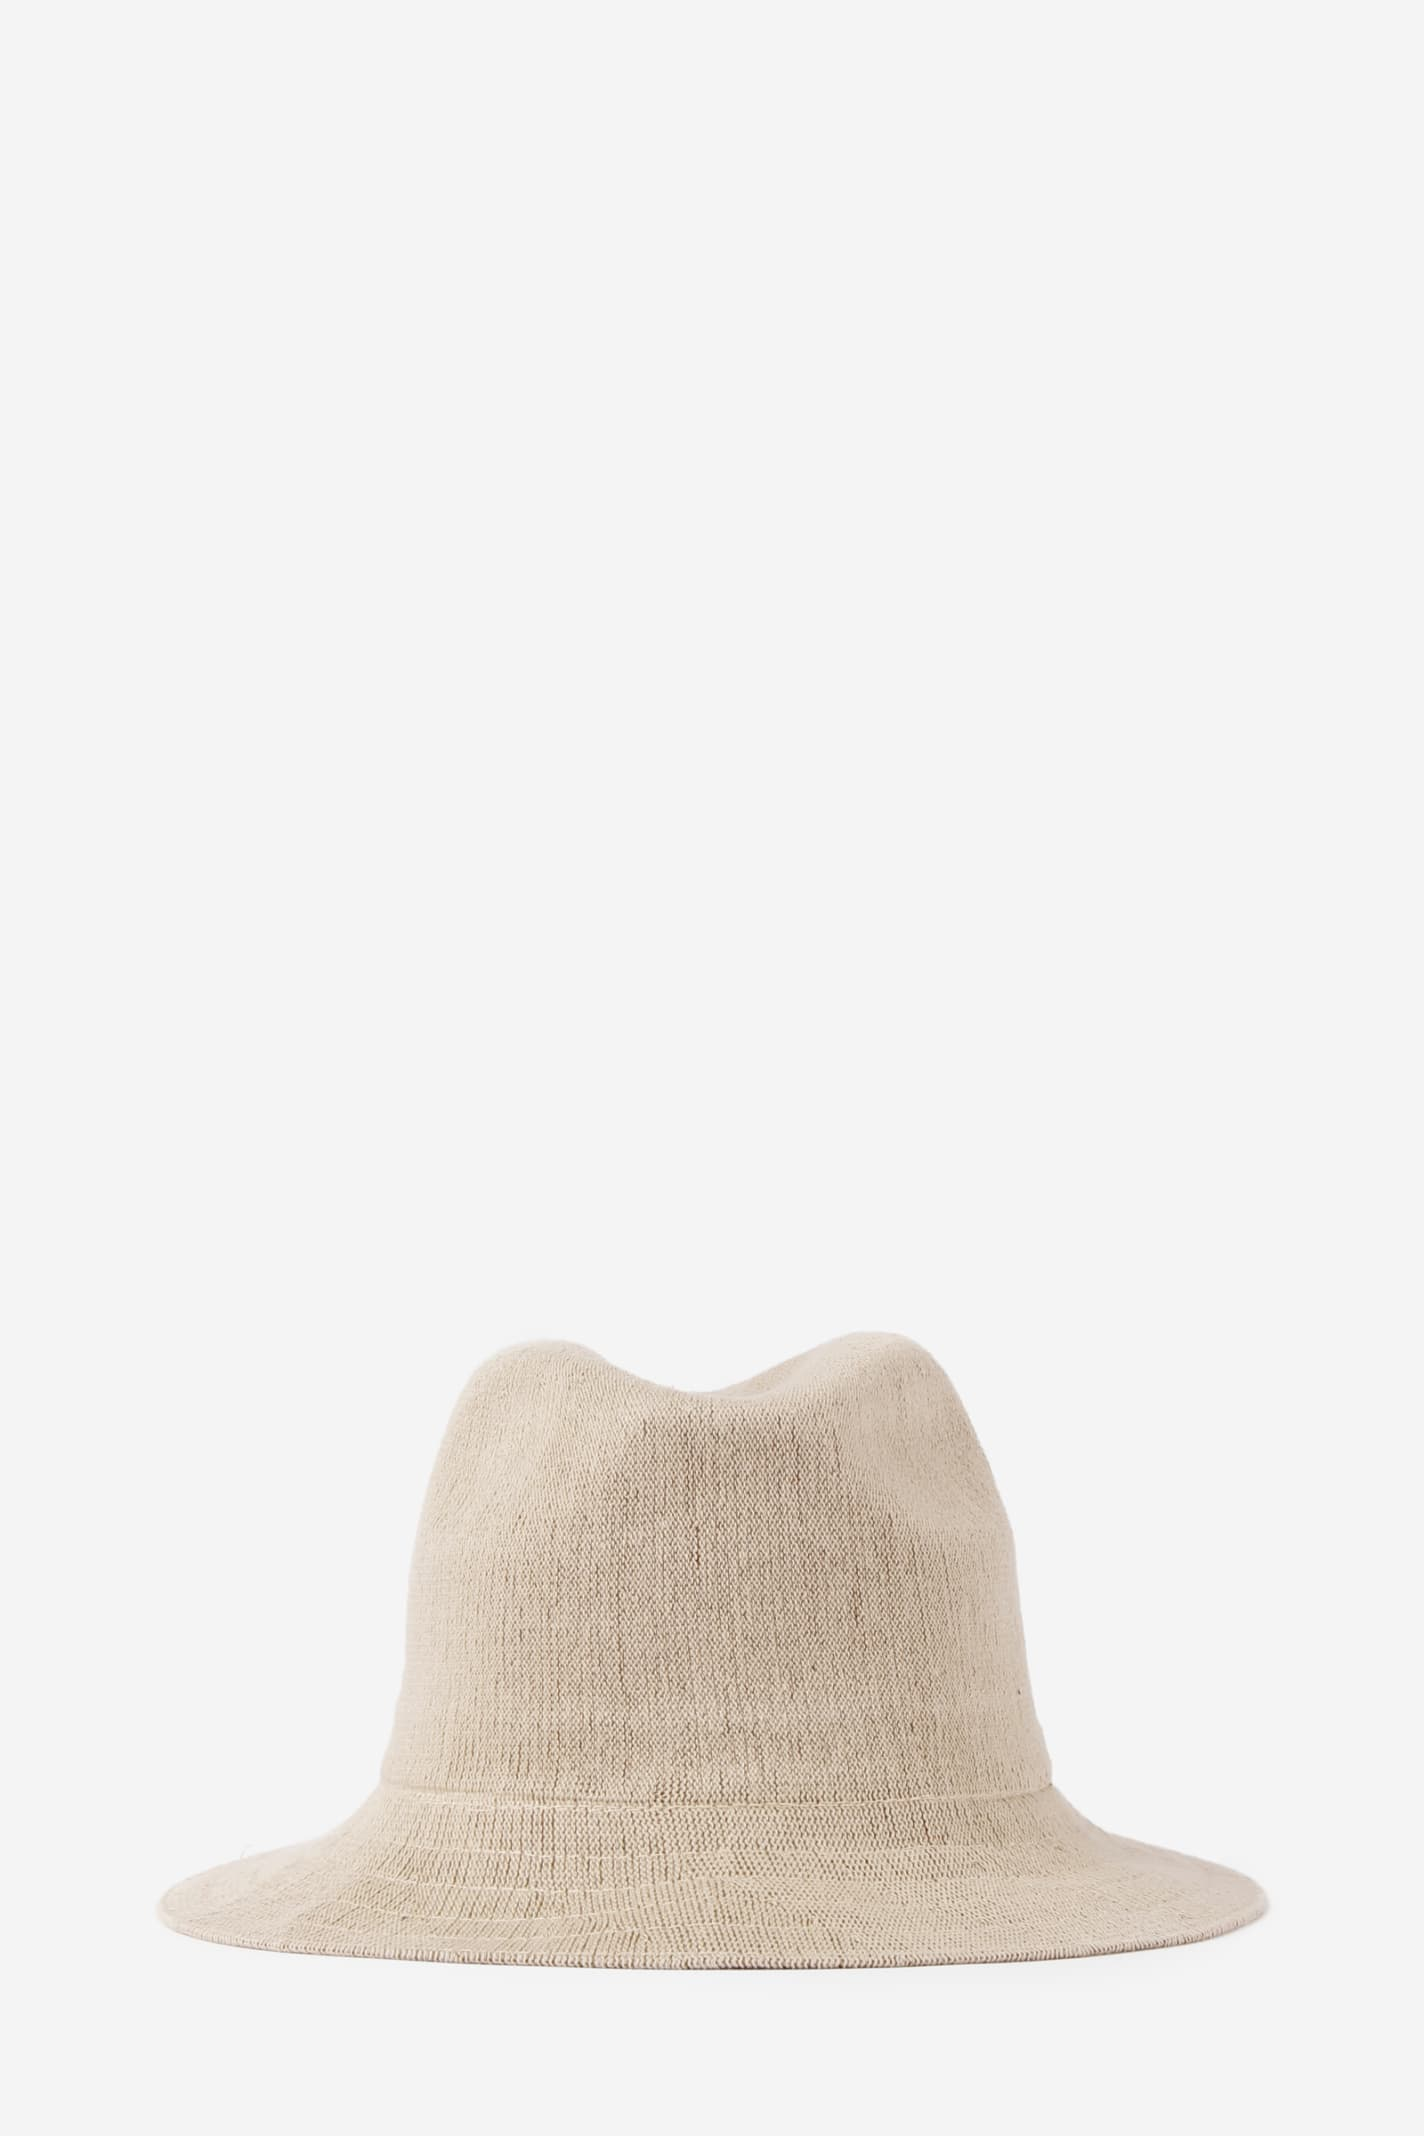 Bamboo Gent Hats